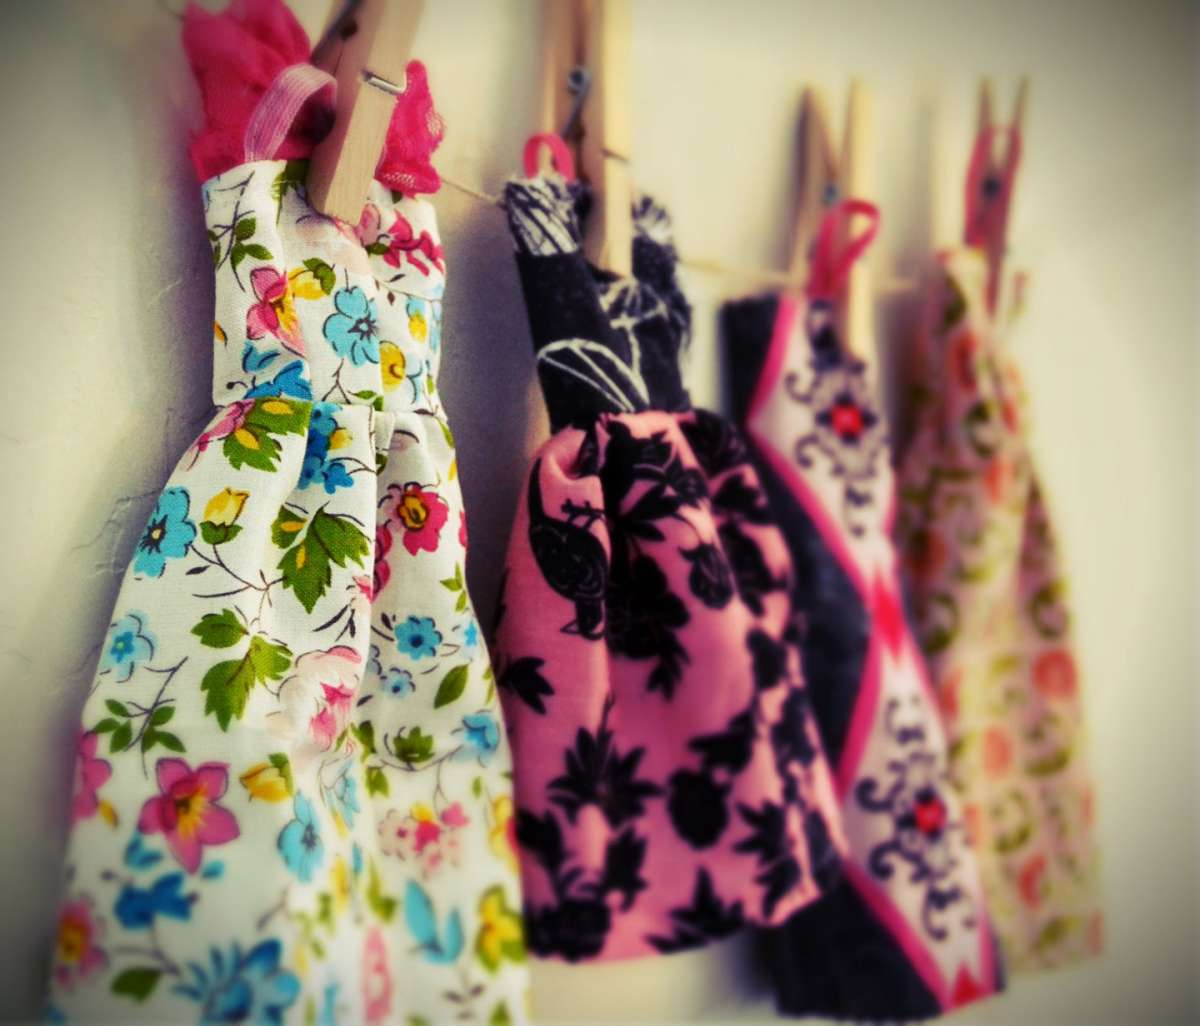 Vestiti per Barbie fai da te  modelli e tutorial  FOTO   7ce79138246